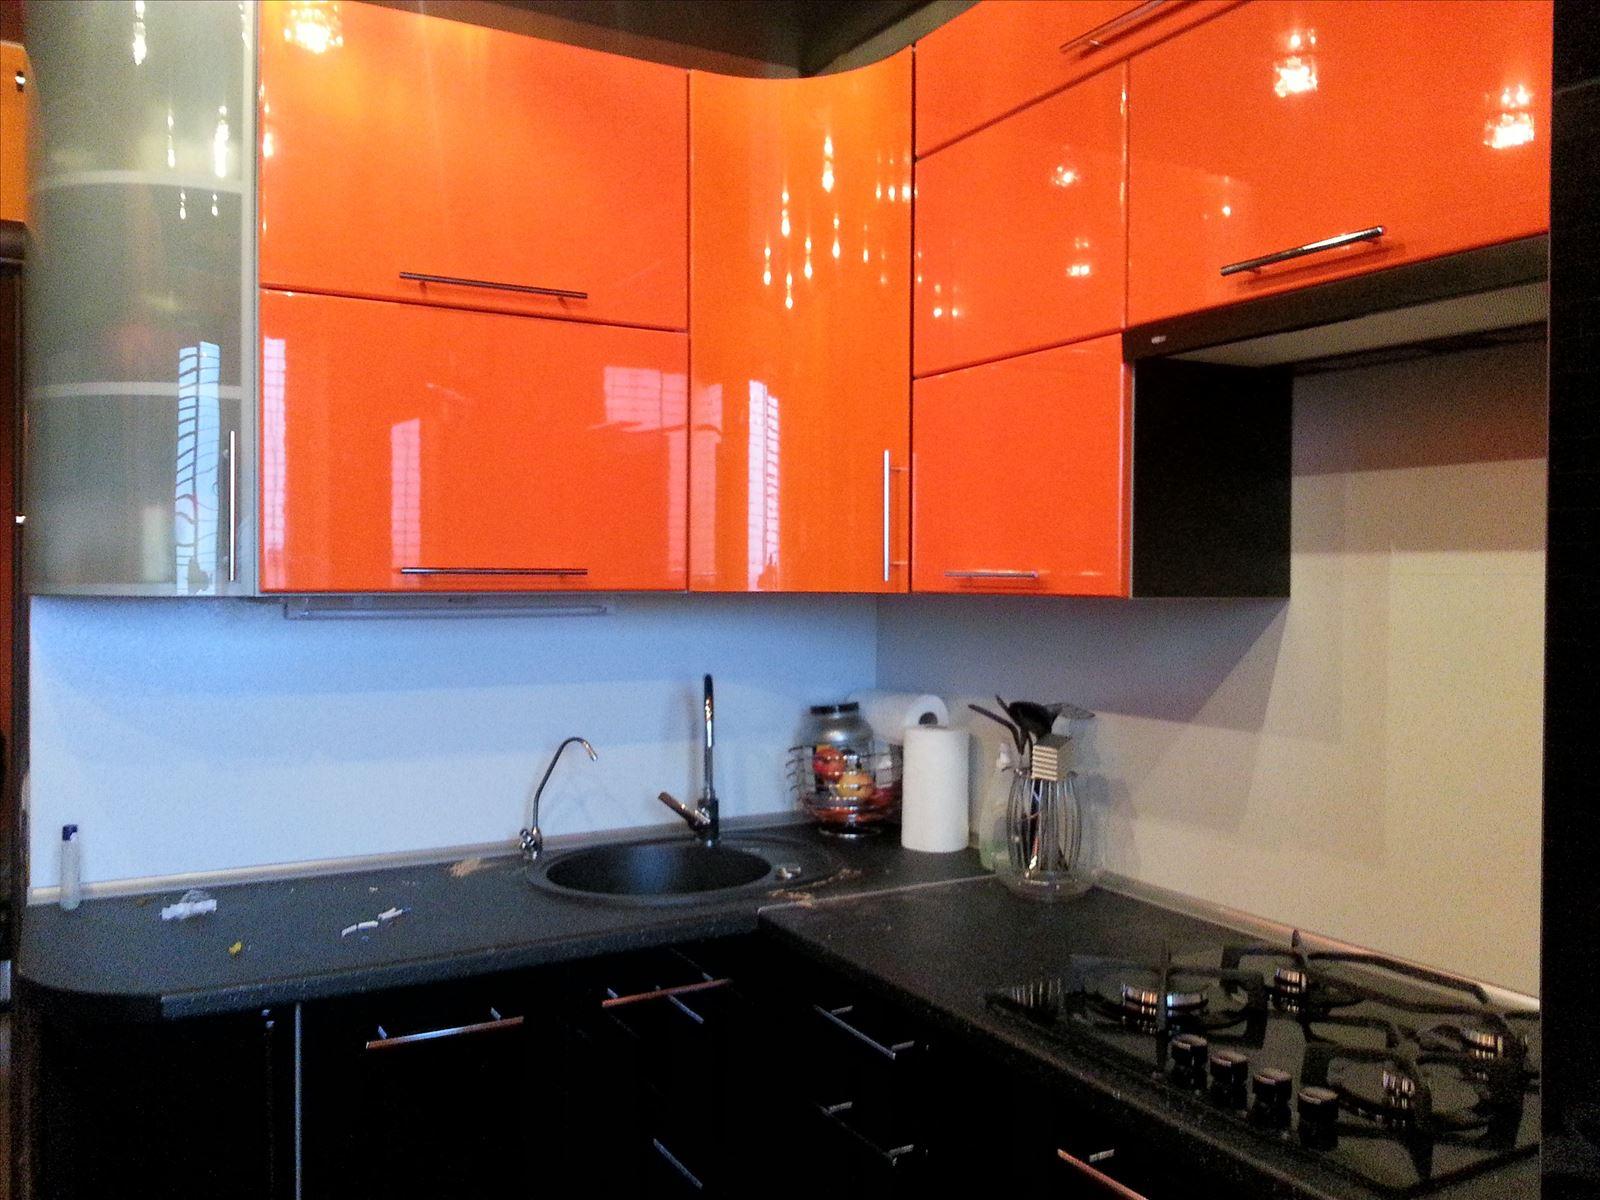 Черно оранжевая кухня фото